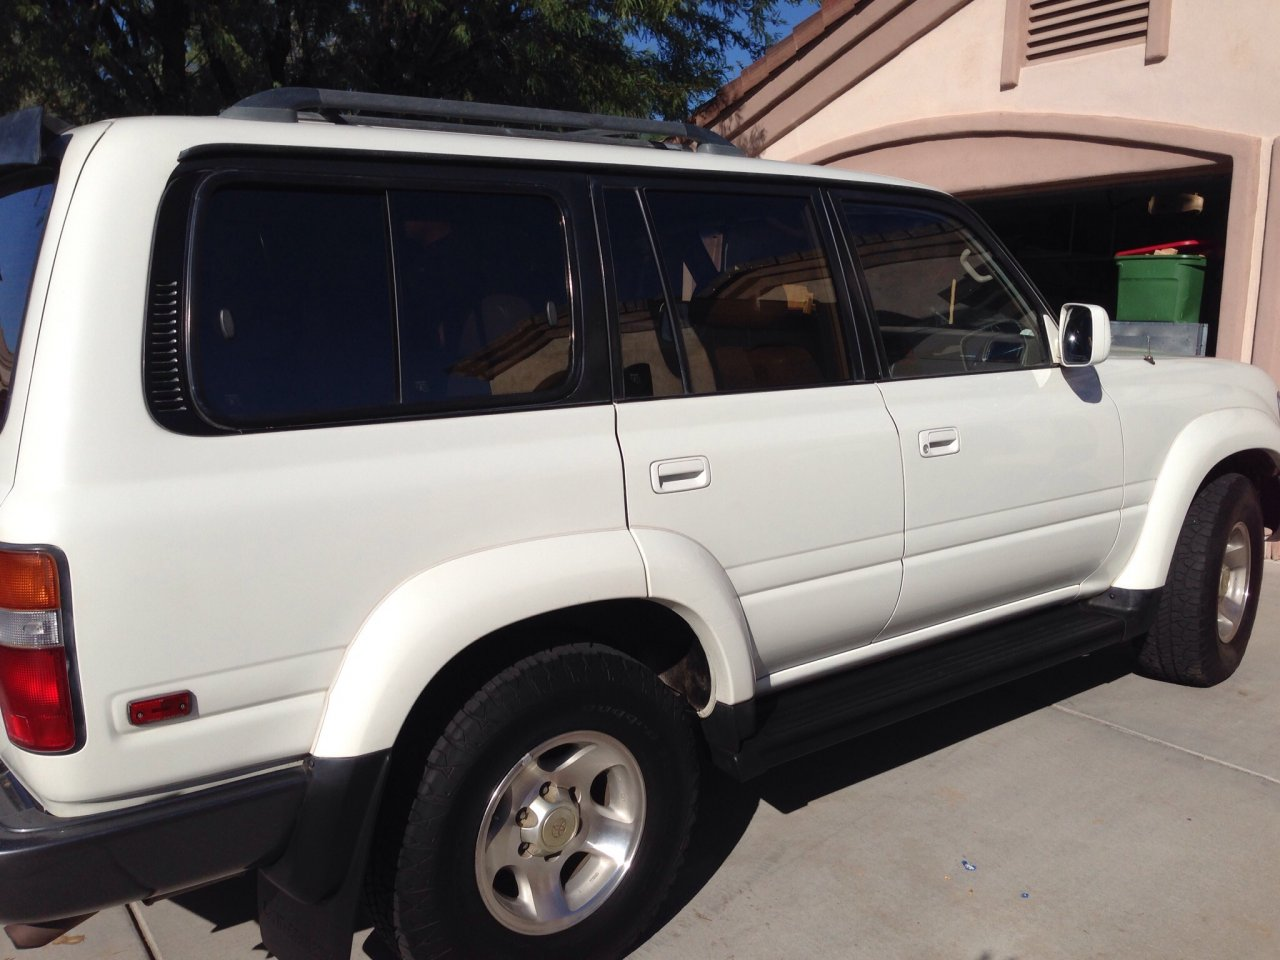 For Sale - WHITE 1996 Toyota Land Cruiser 80 series FJ80 ...